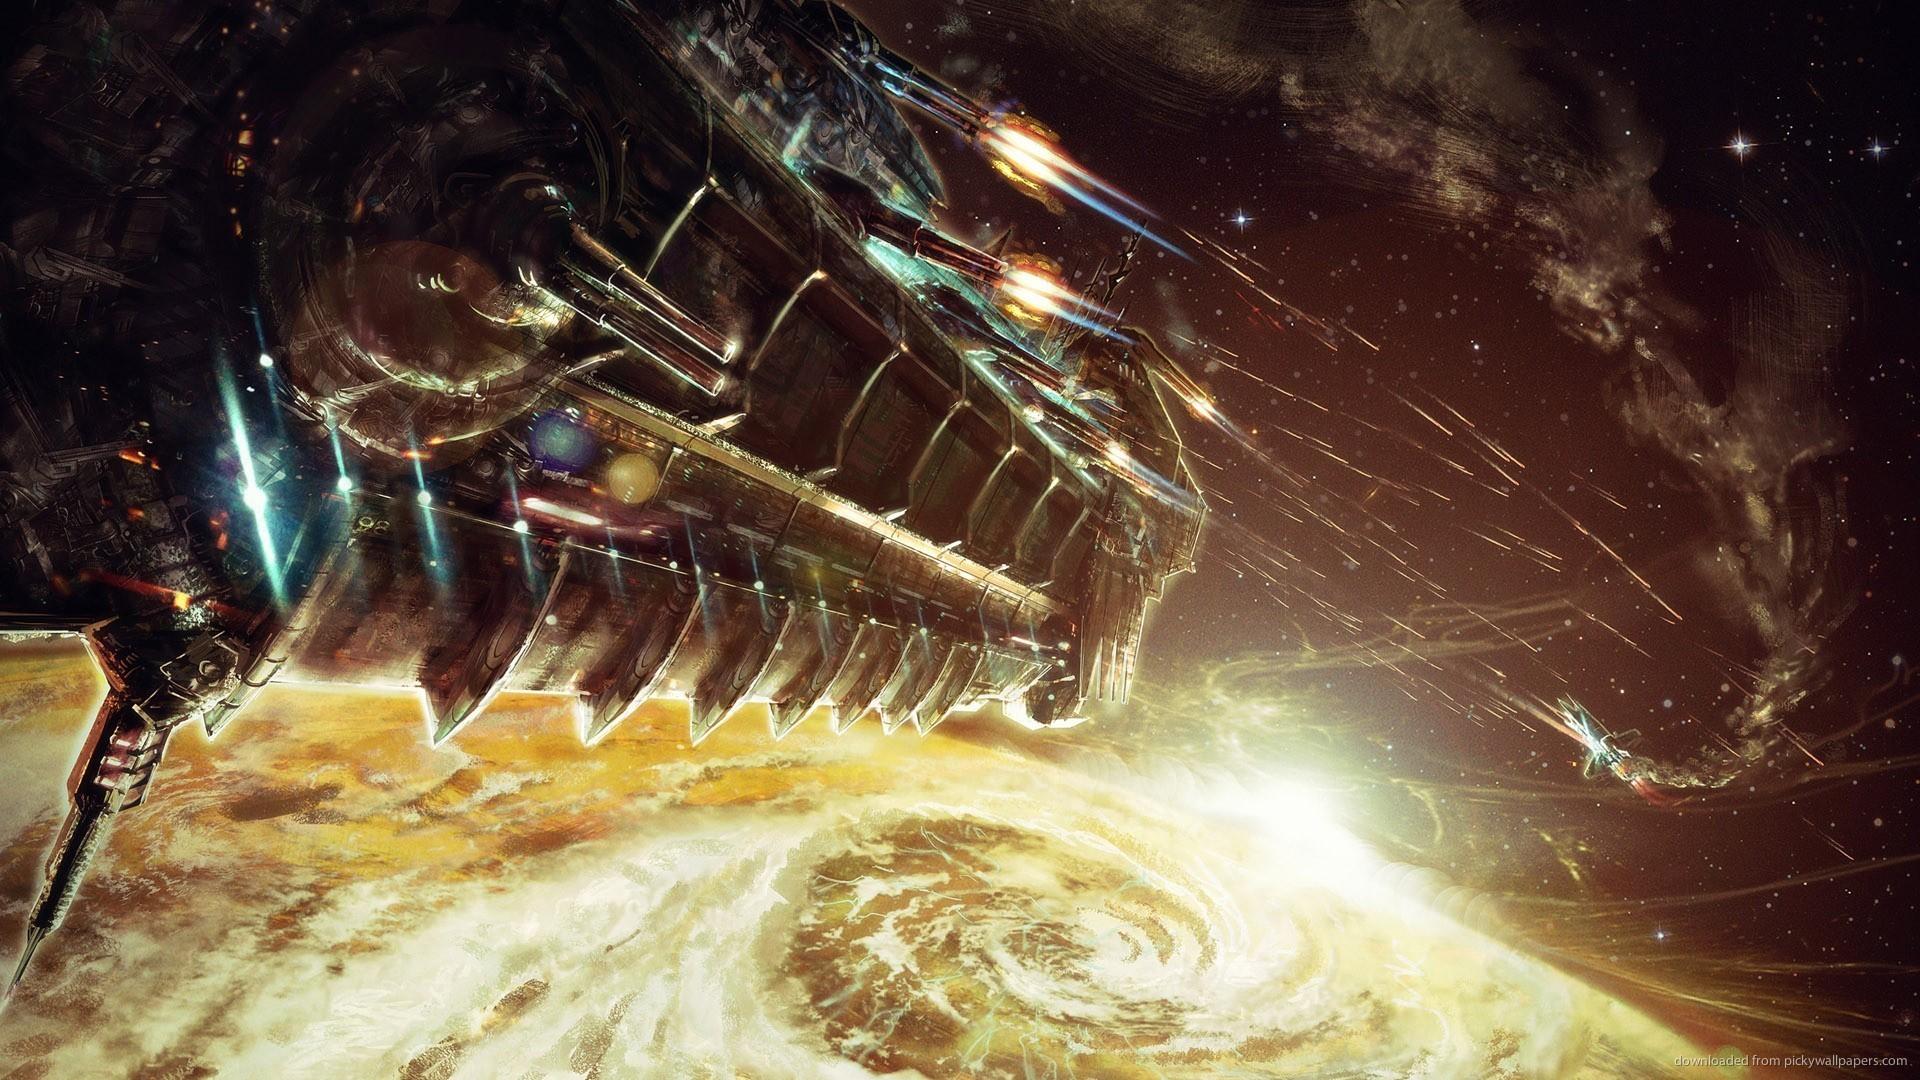 HD Spaceship battle wallpaper